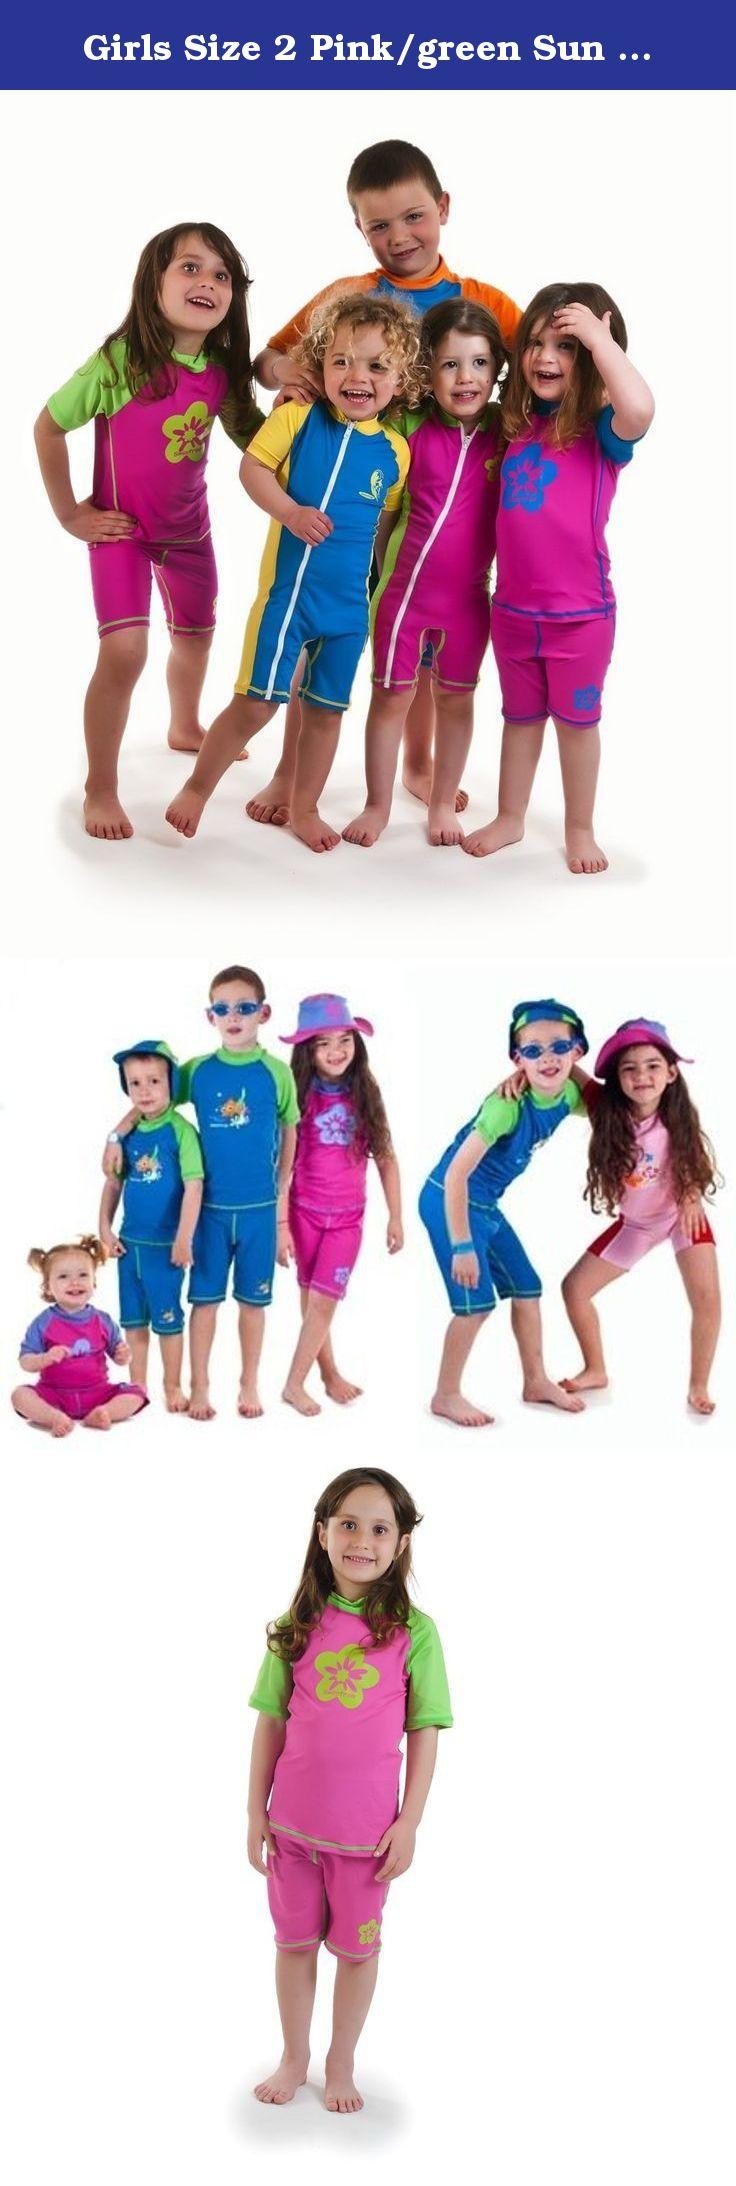 Girls Size 2 Pink//green Sun Uv Protective Rashguard /& Shorts Age 2 Years Old